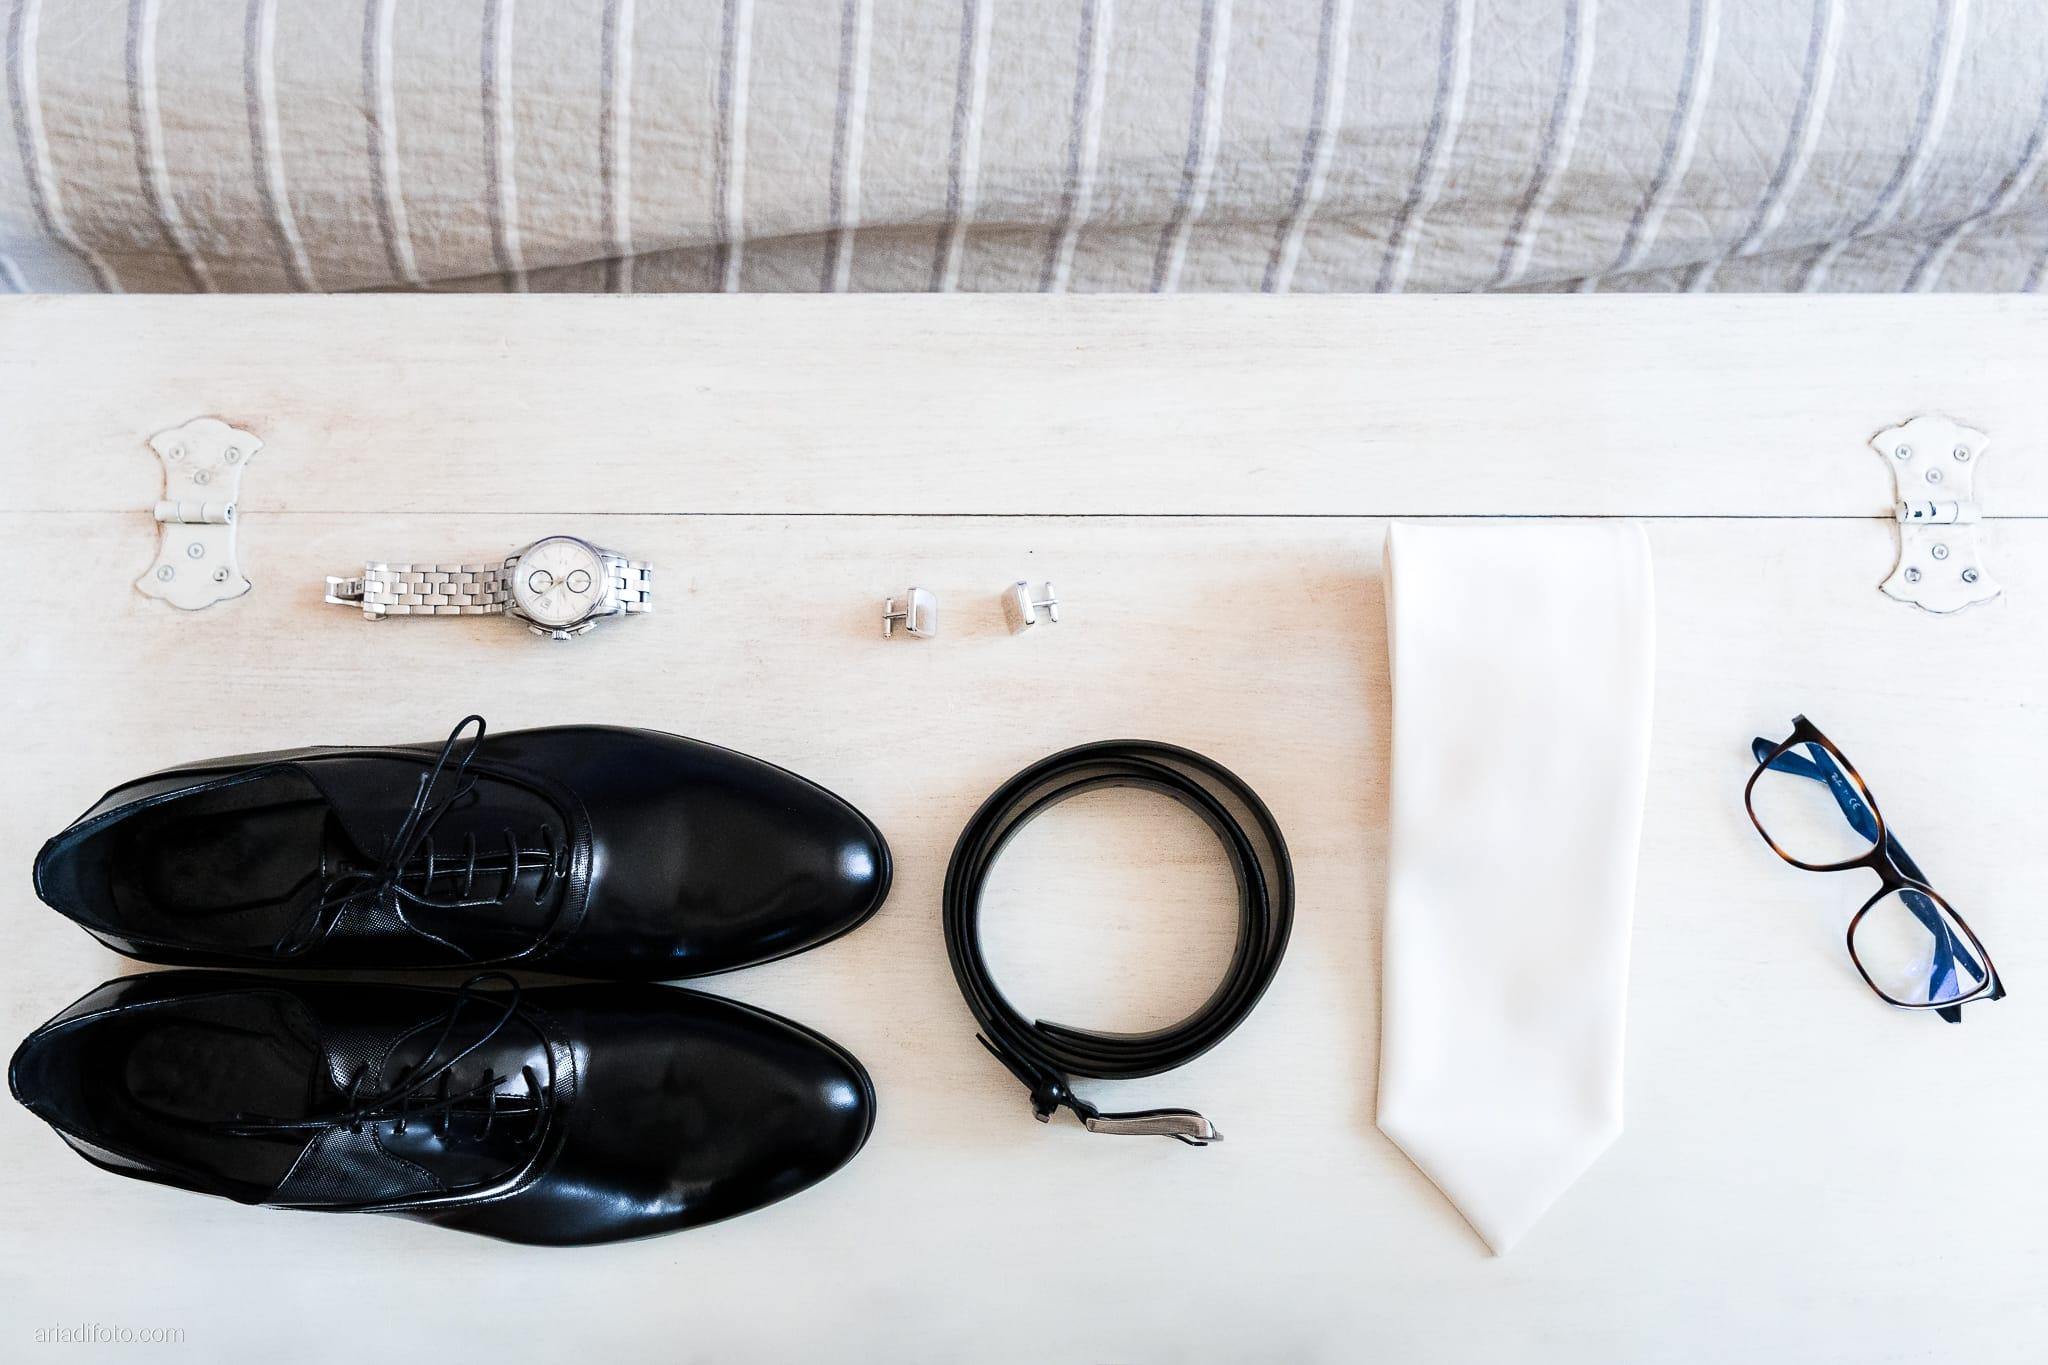 Lavinia Daniele Matrimonio Medea Gorizia Villa Elodia Trivignano Udinese Udine preparativi sposo dettagli scarpe cravatta occhiali cintura orologio gemelli